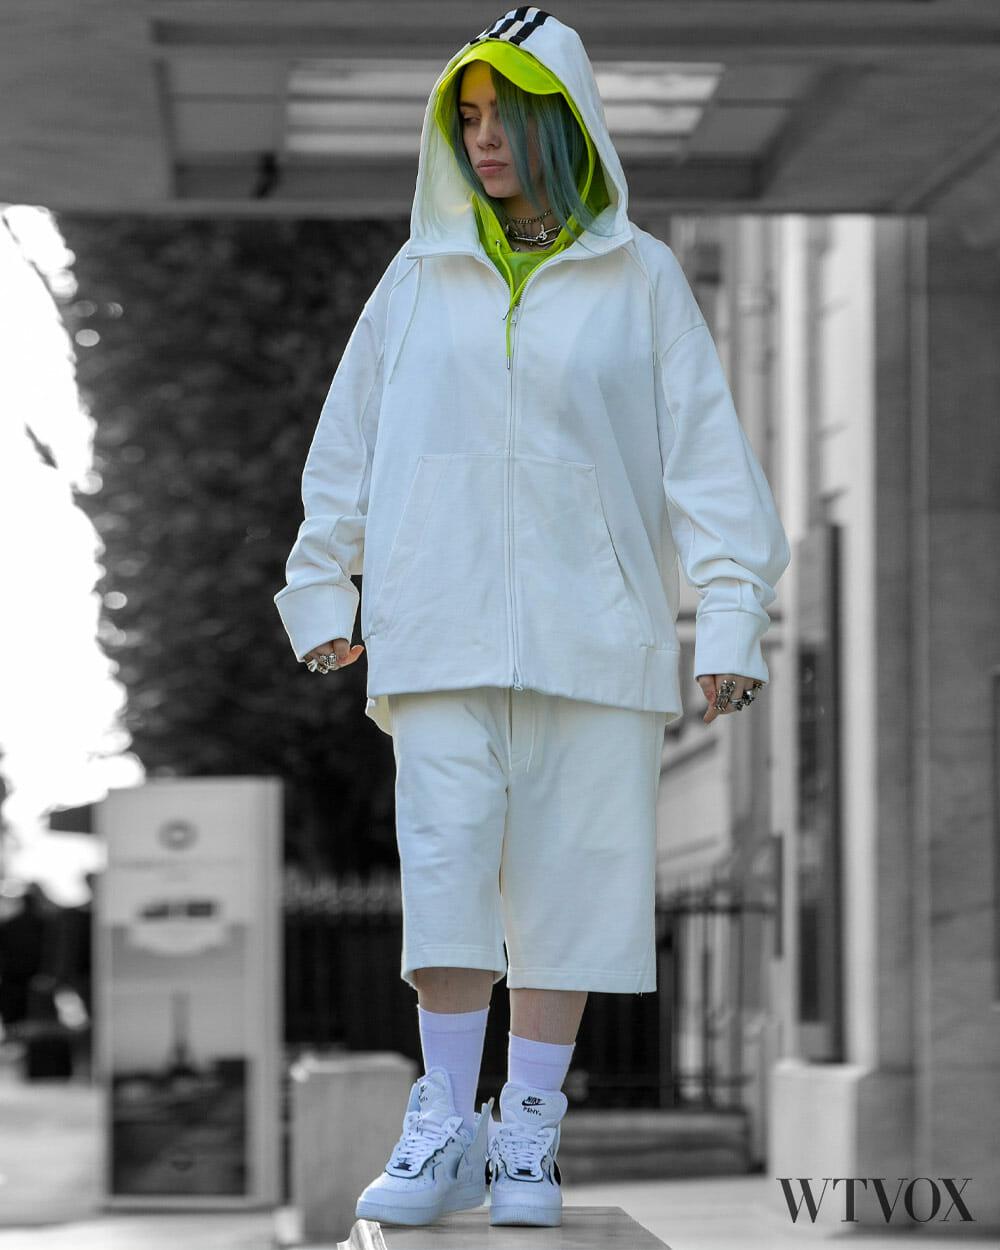 Billie Eilish in streetwear - white colour